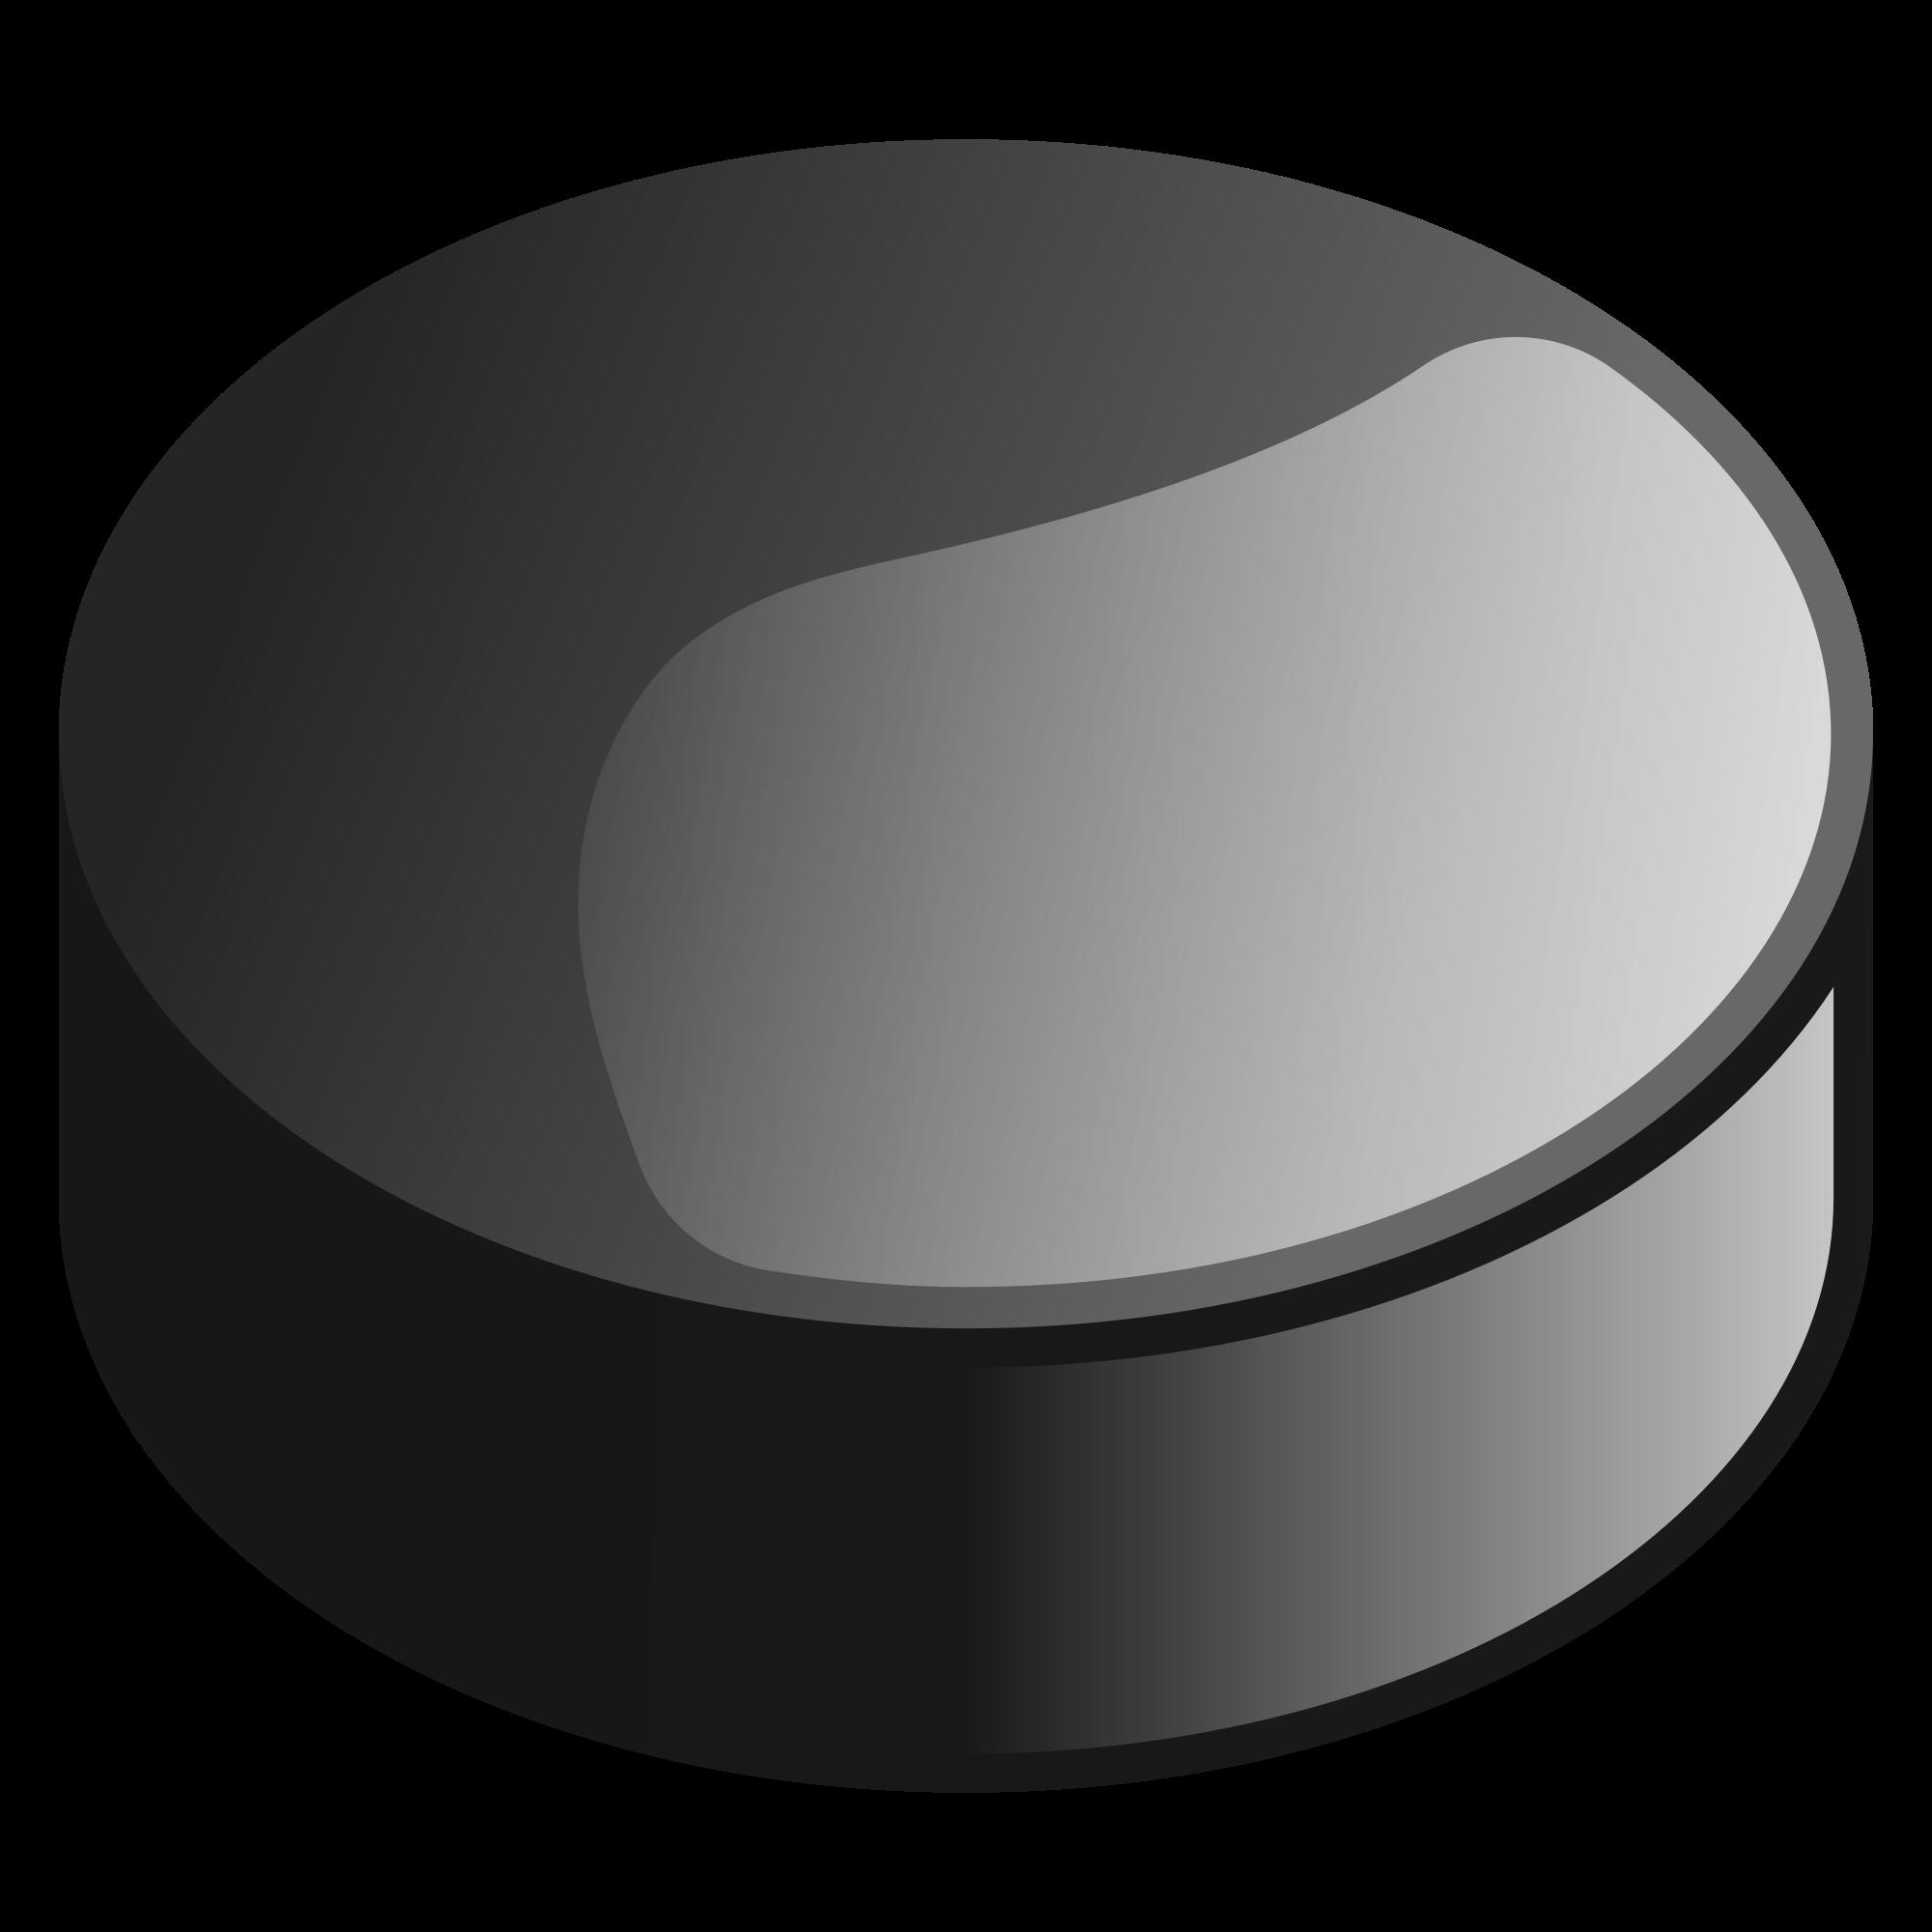 Custom Hockey Pucks | ChalkTalkSPORTS. U-Custom Hockey Pucks | ChalkTalkSPORTS. User:Rherms716/work - Wikipedia, the free encyclopedia-13